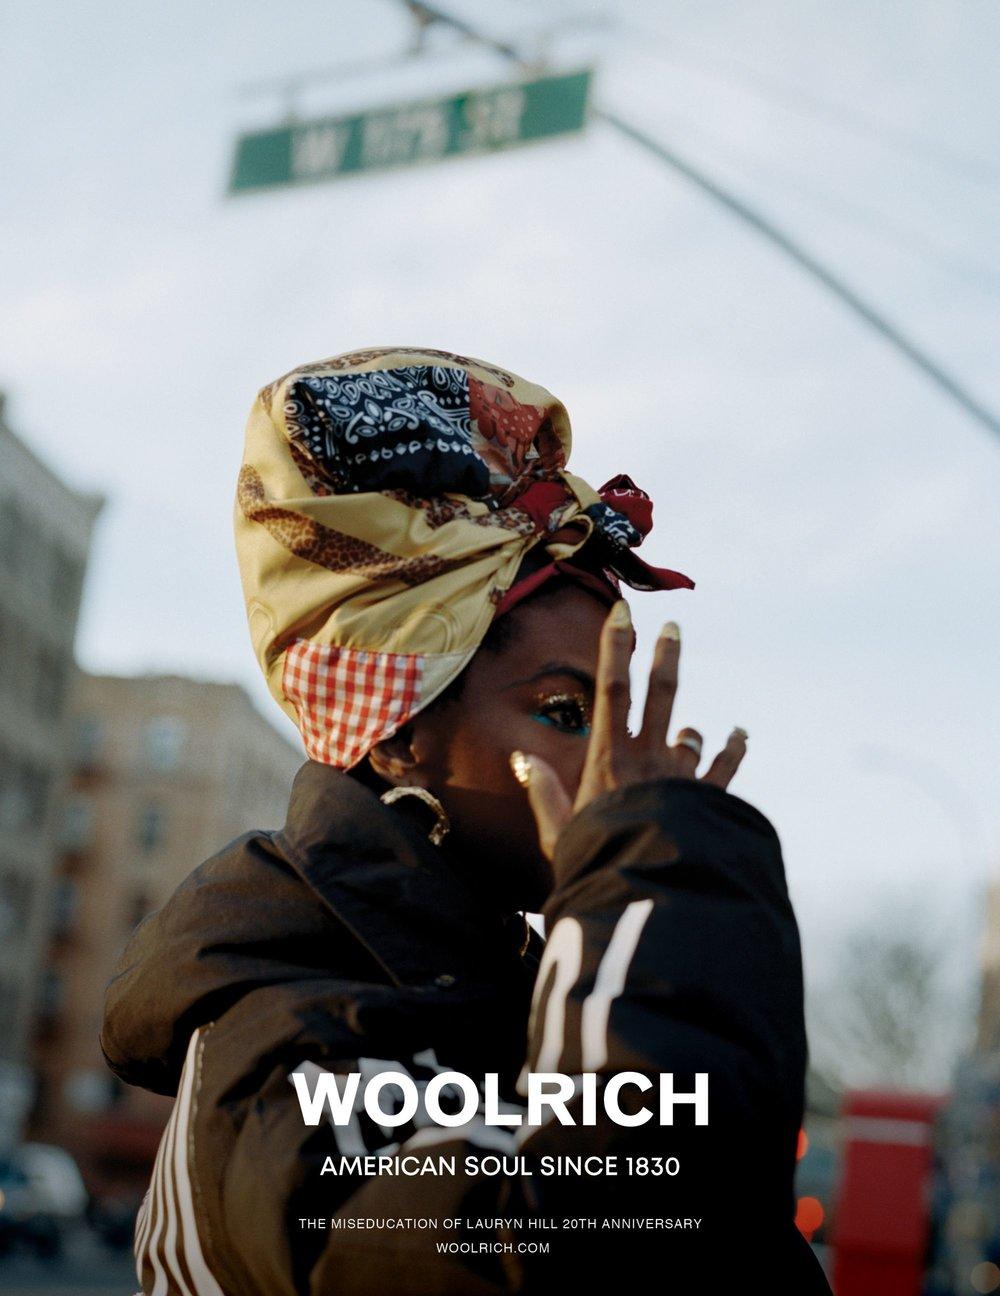 Woolrich-FW-18-ADV-Campaign-11.jpg